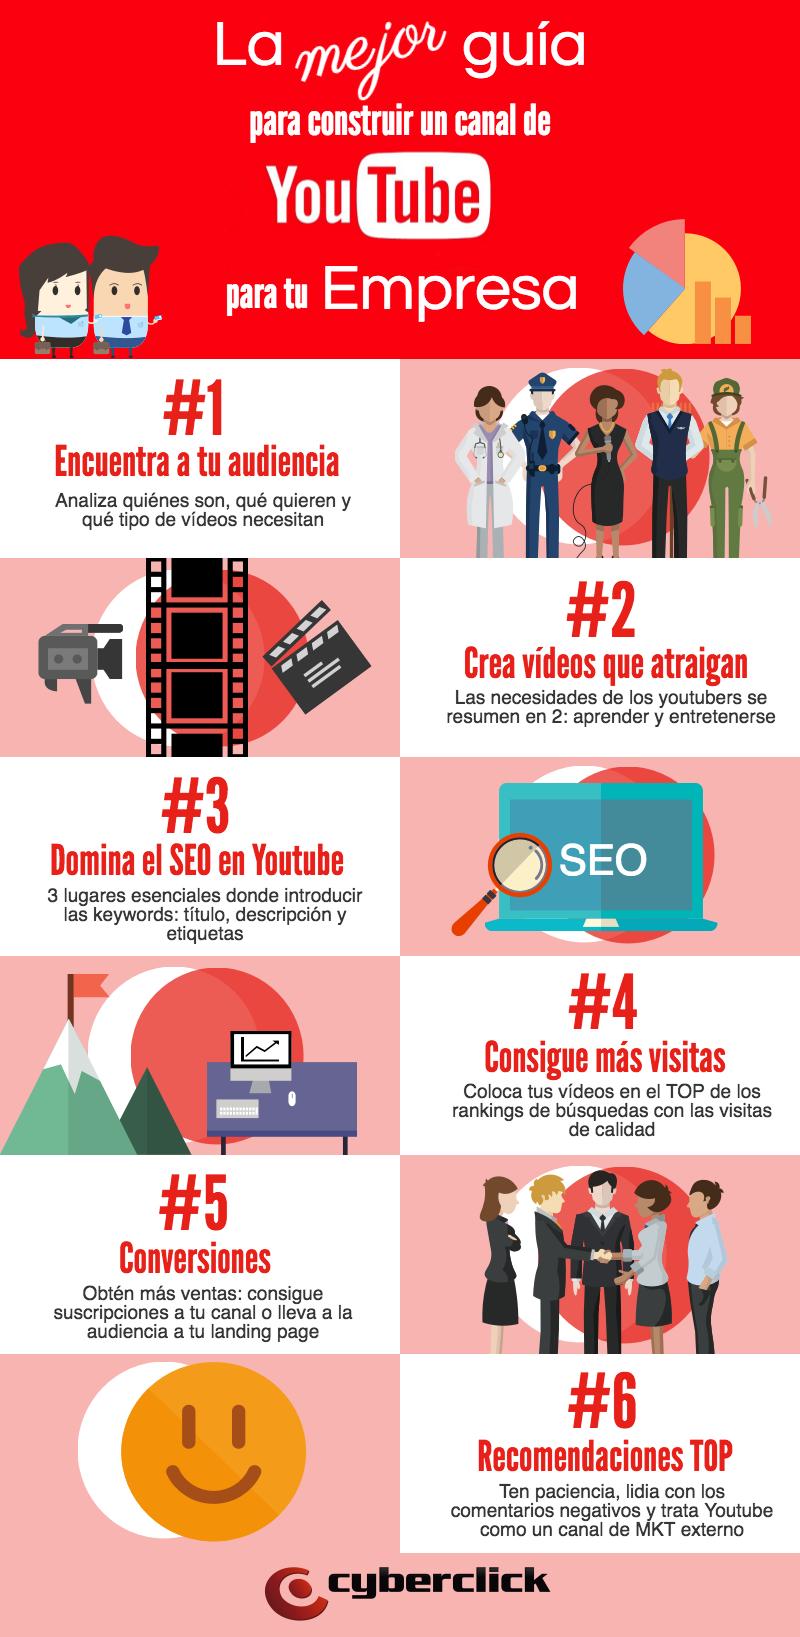 La_mejor_guia_para_construir_un_canal_de_Youtube_para_tu_empresa.png